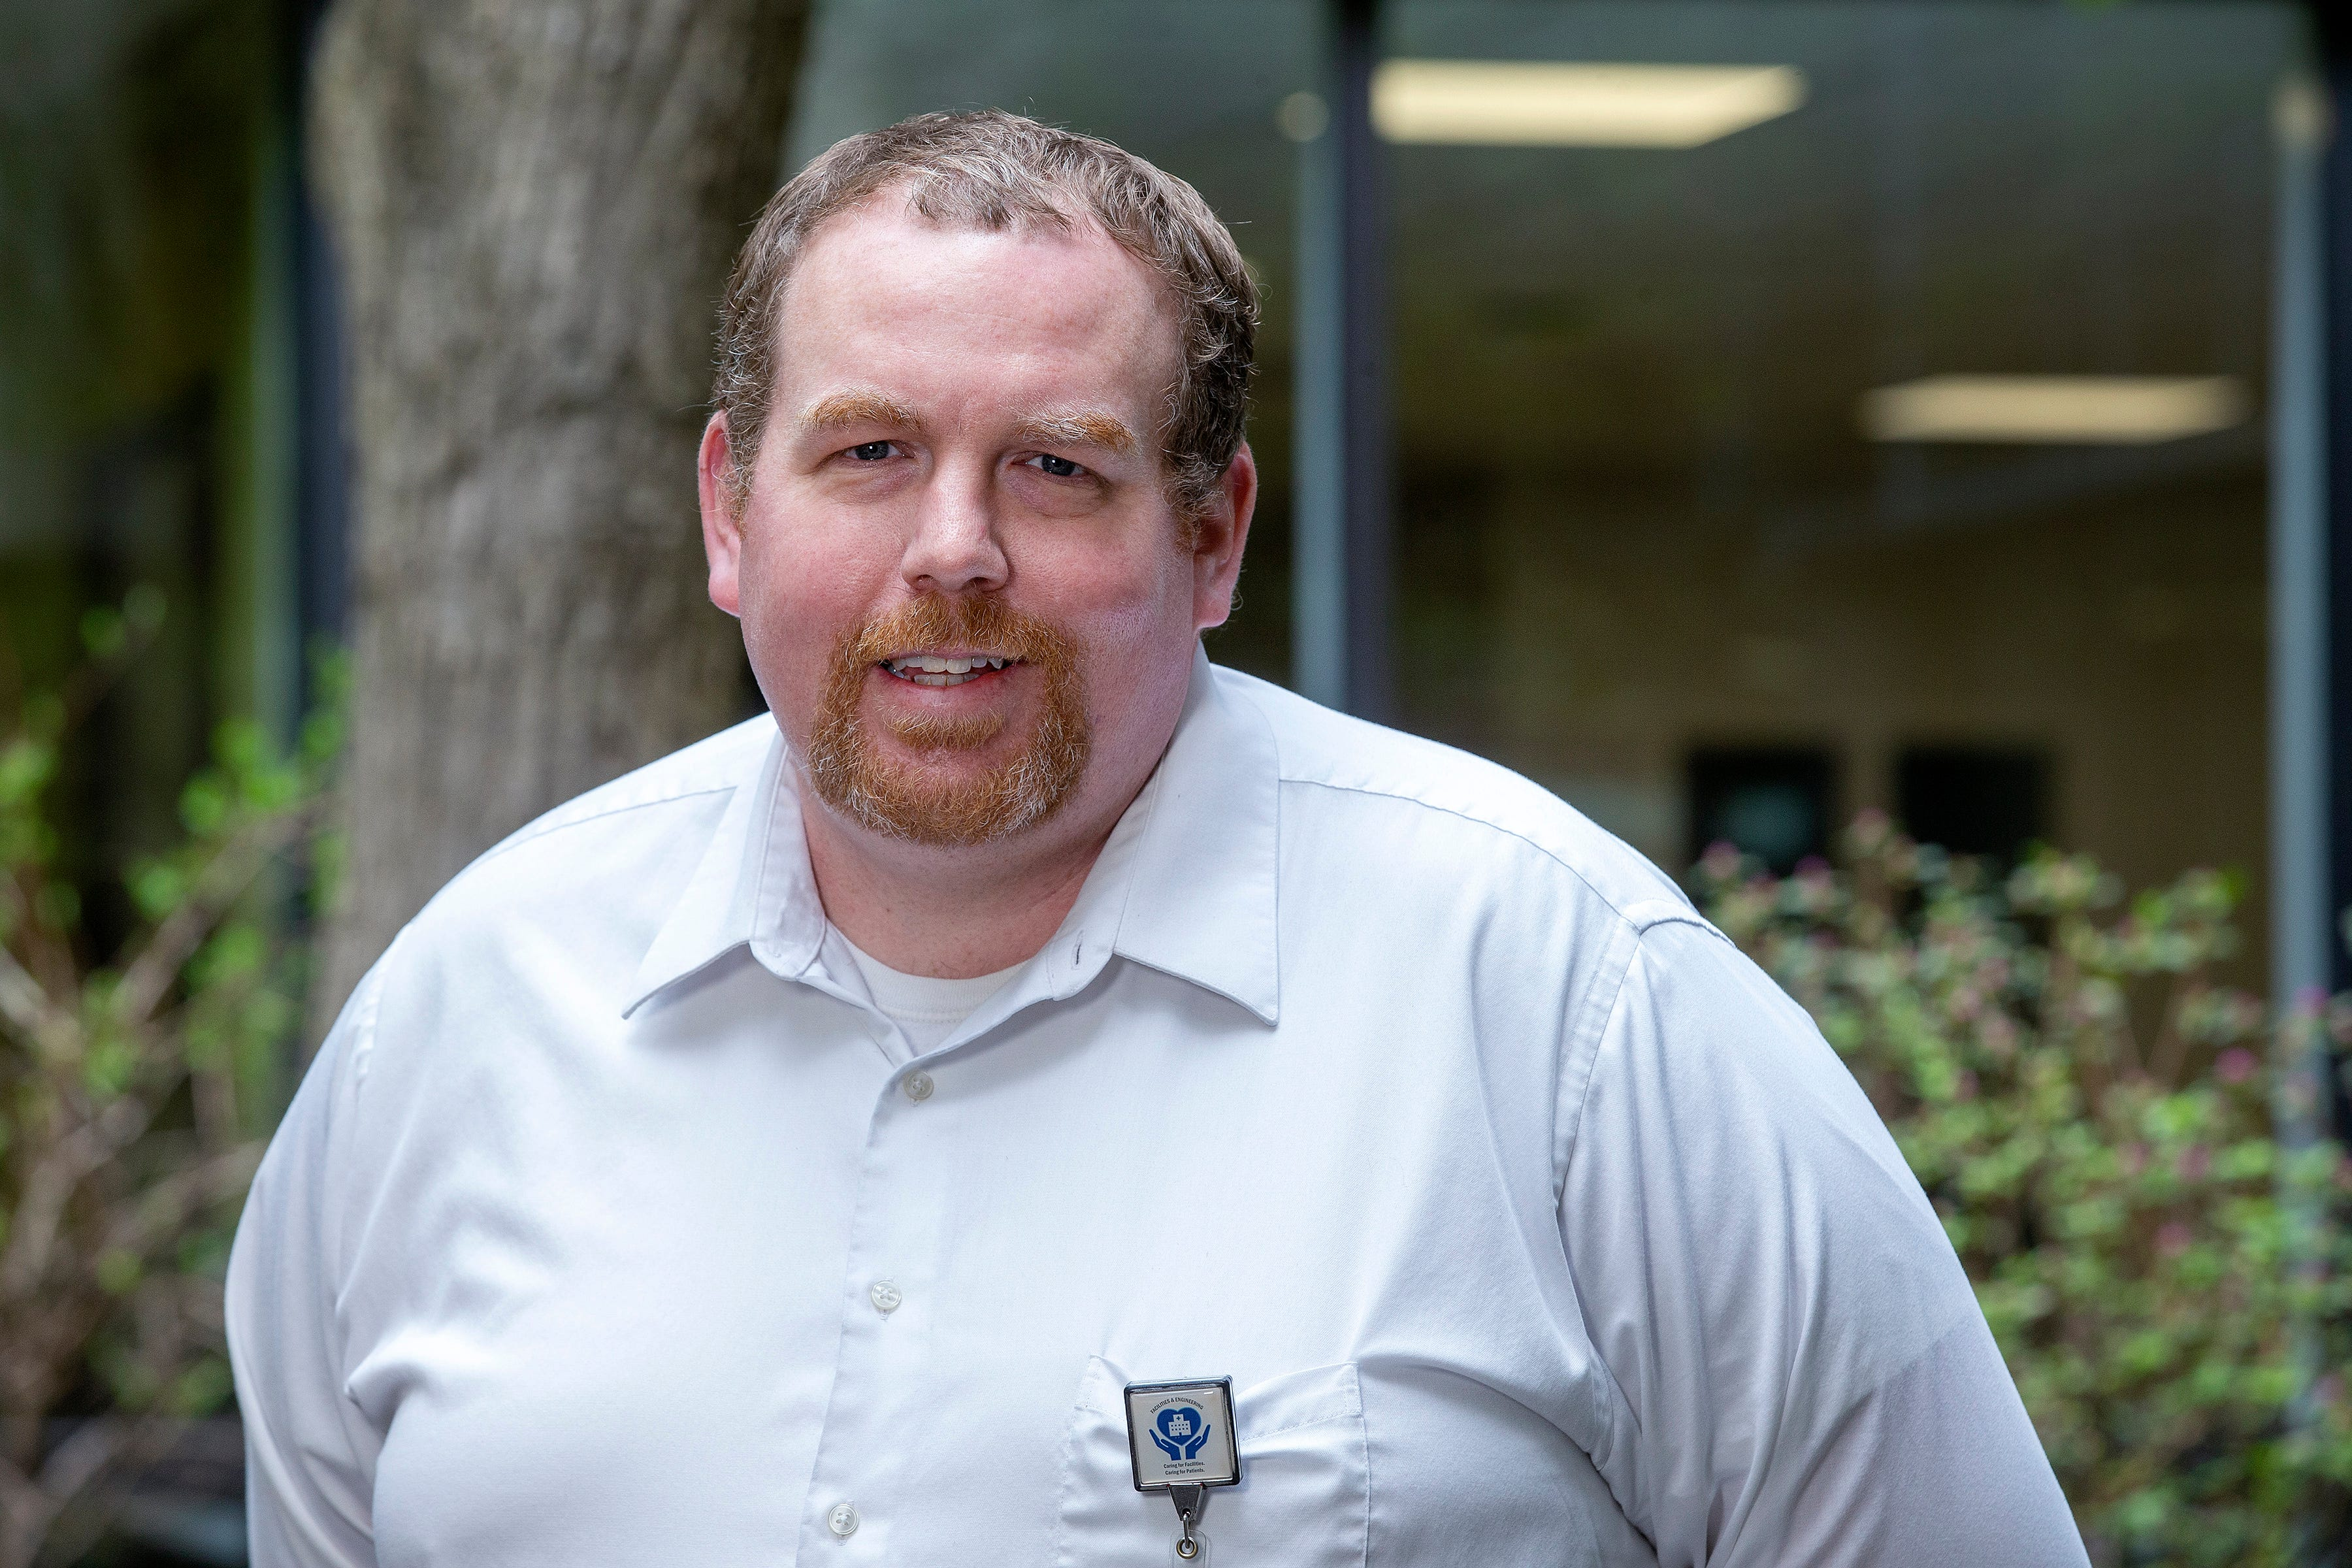 Adam Tart, facilities management director, Community Medical Center